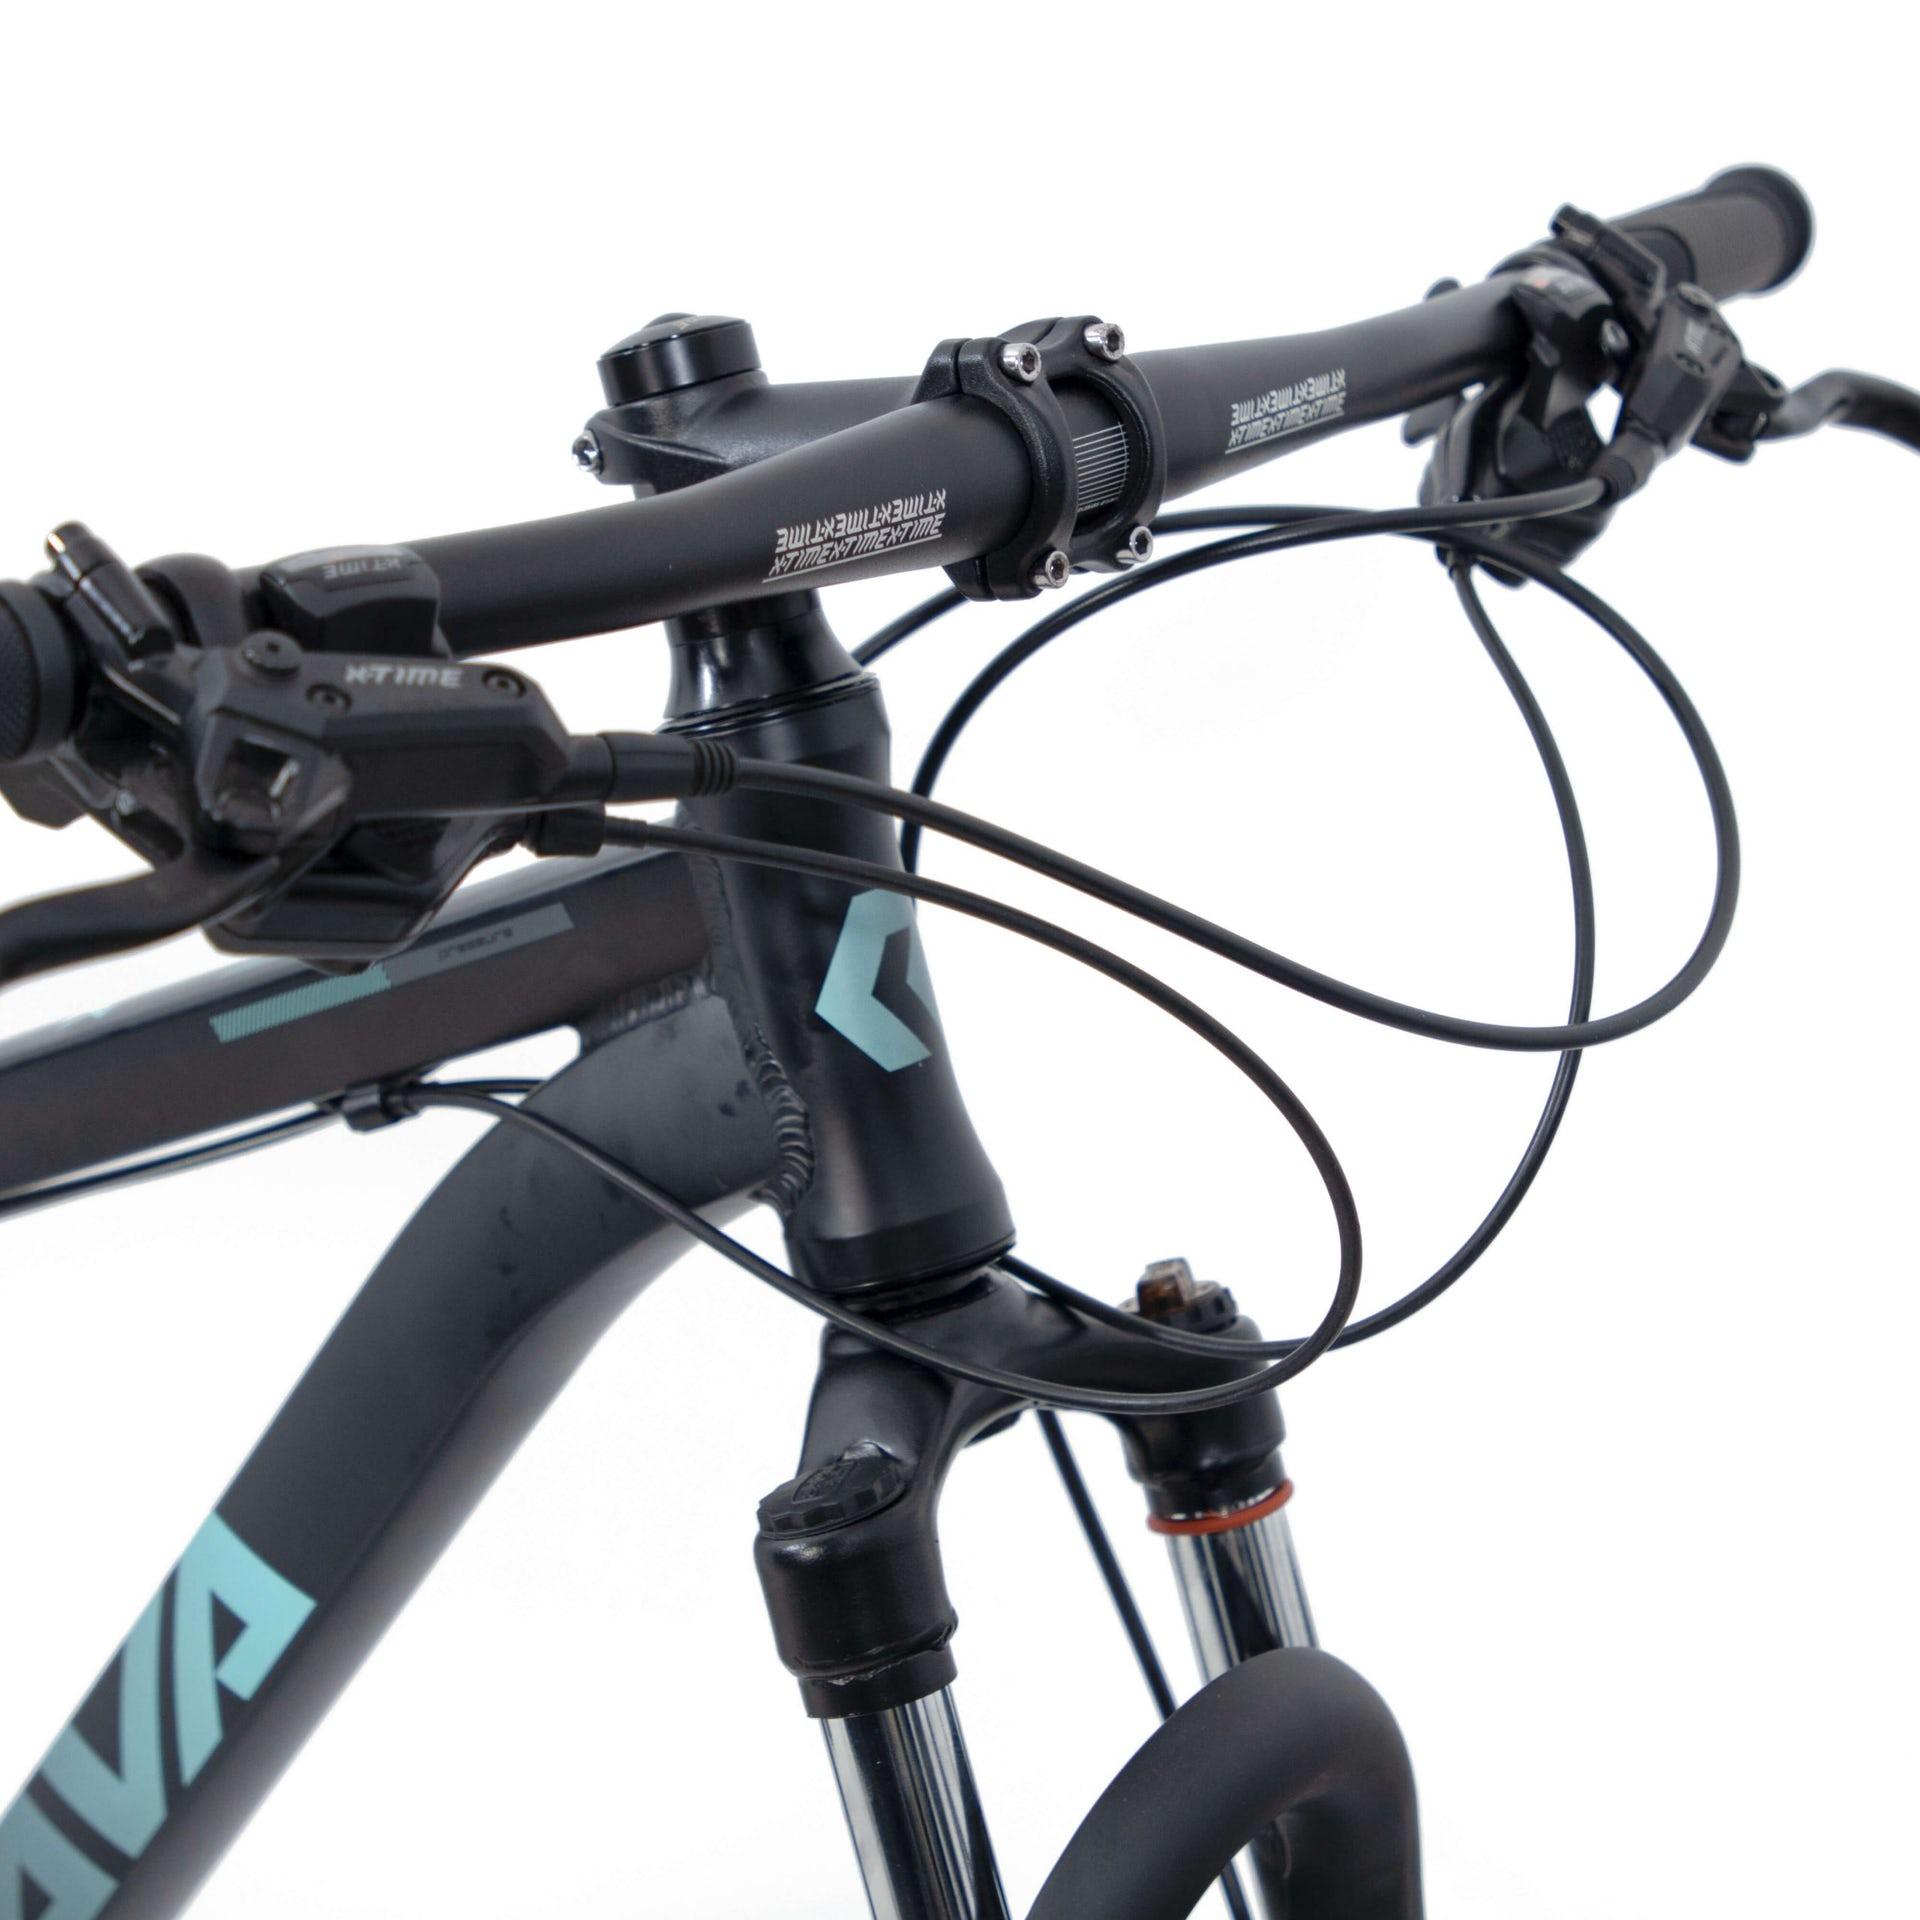 BICICLETA  29 RAVA PRESSURE X-TIME 2X10 VEL. HIDRAULICO PTO/AZUL (2021)